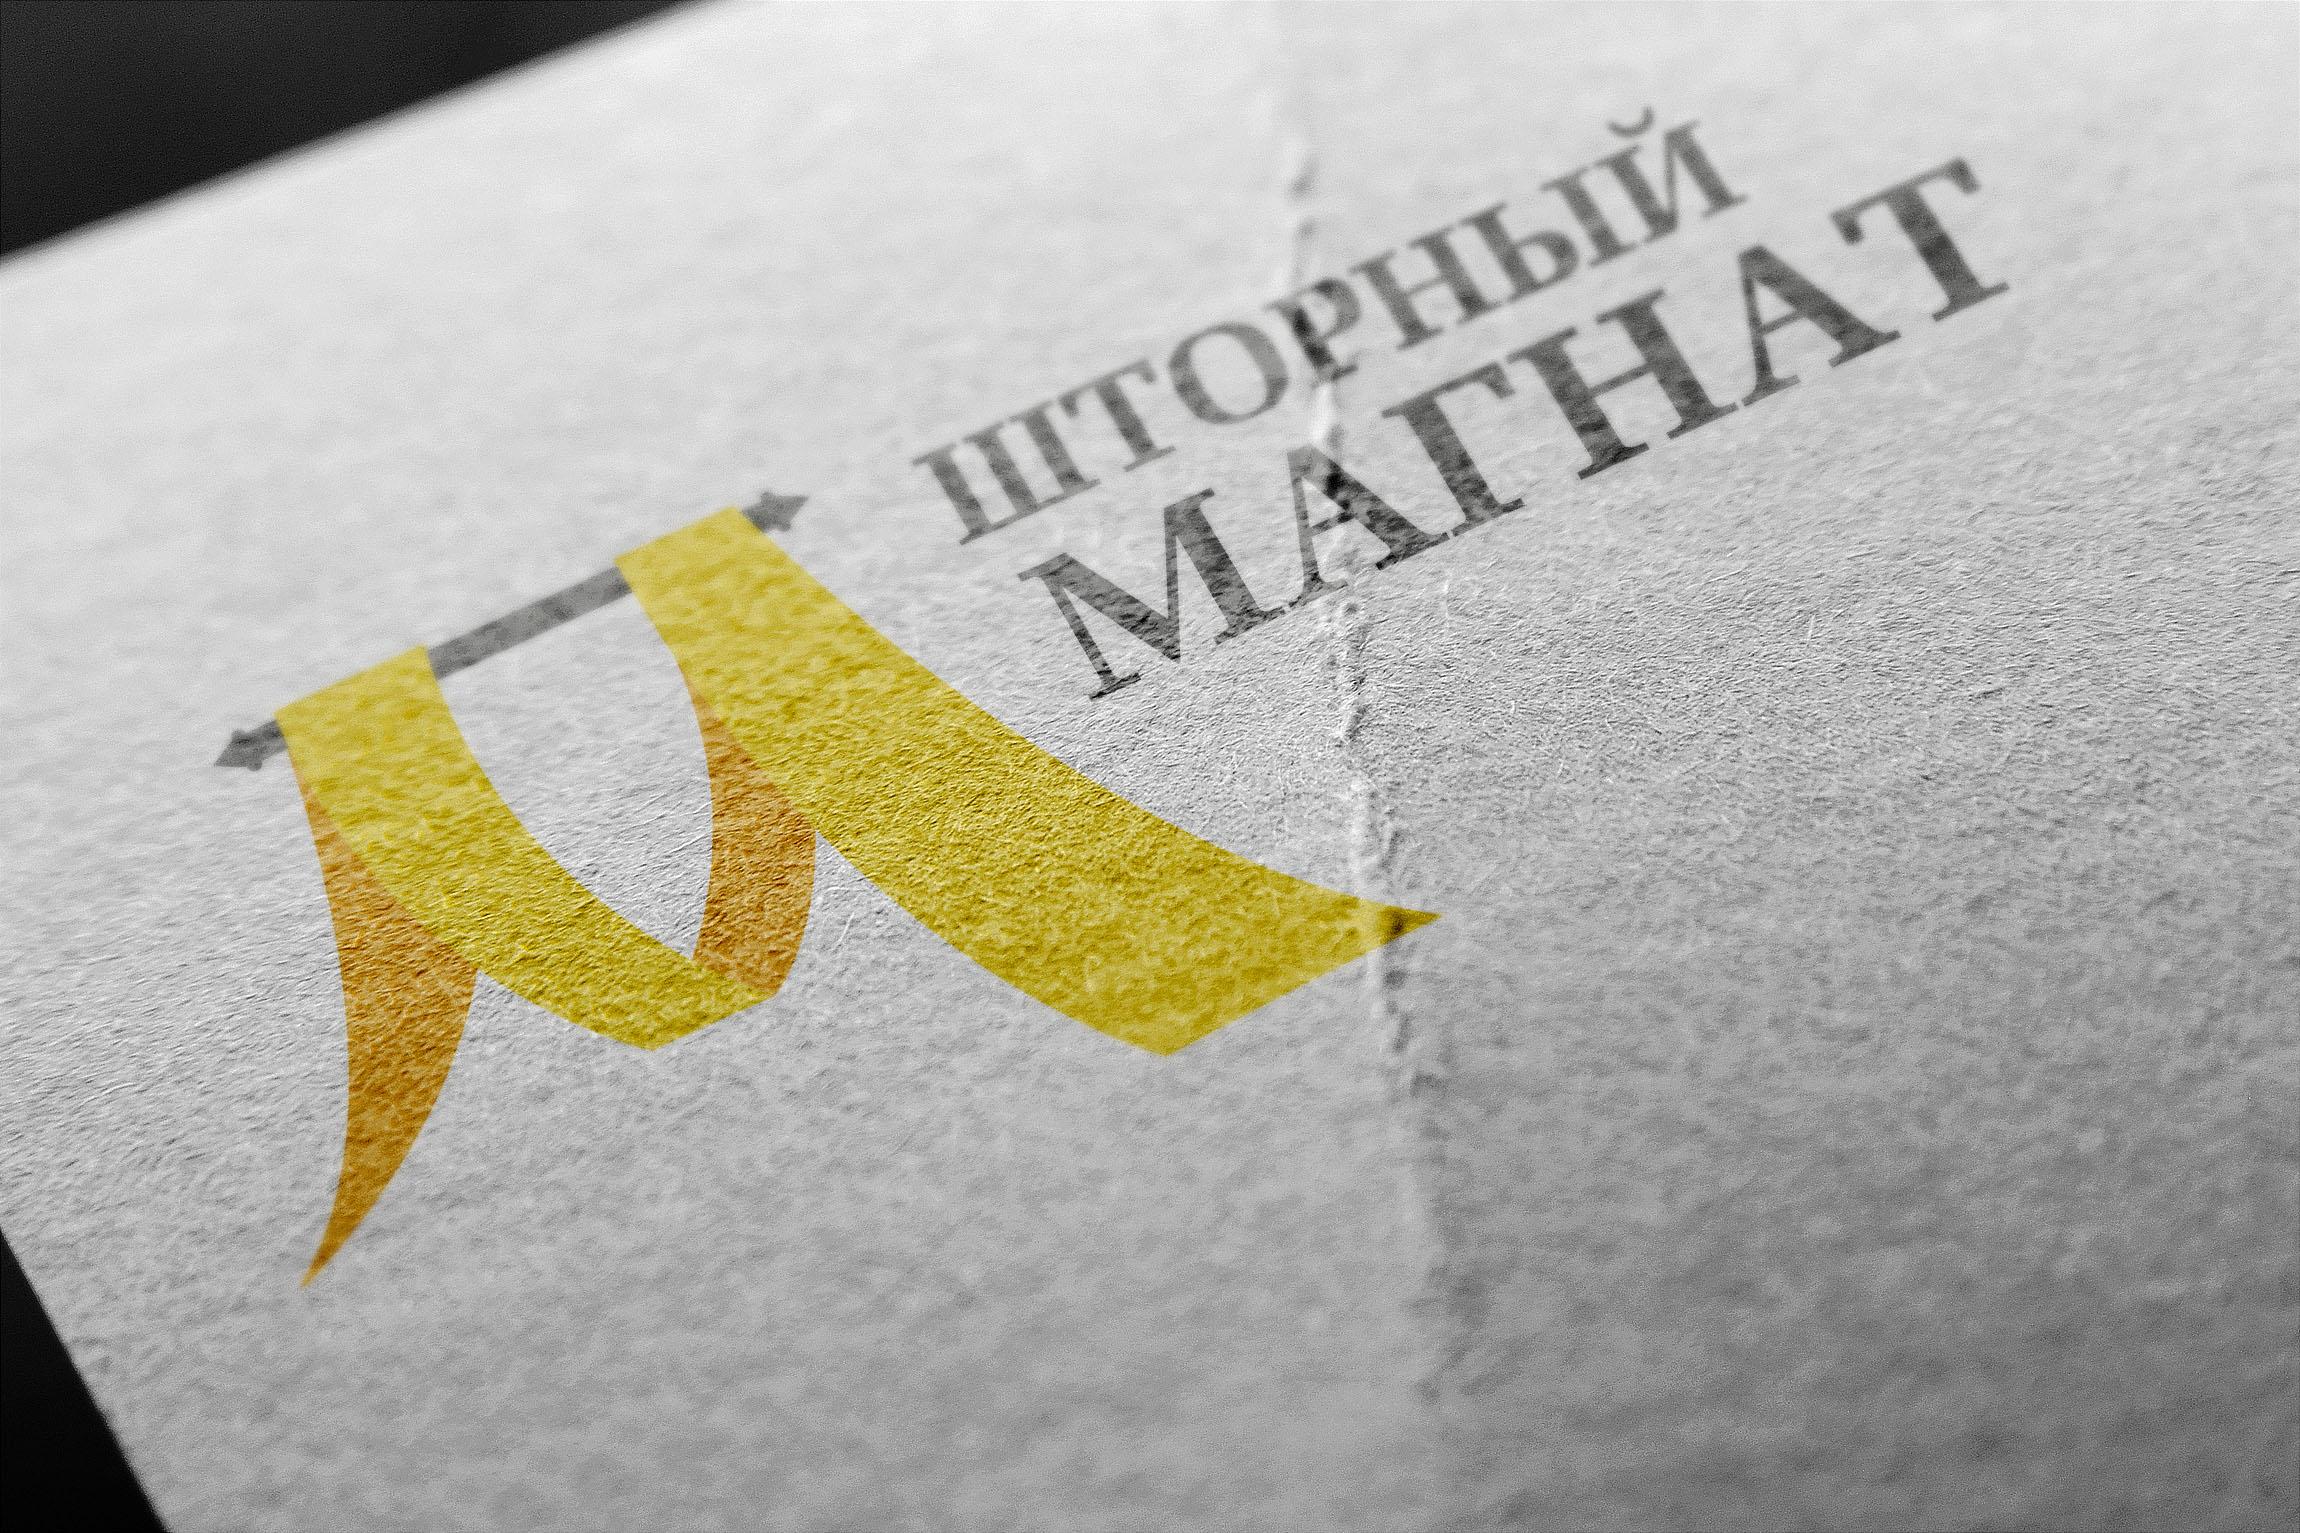 Логотип и фирменный стиль для магазина тканей. фото f_7125cd6ca31c58e5.jpg